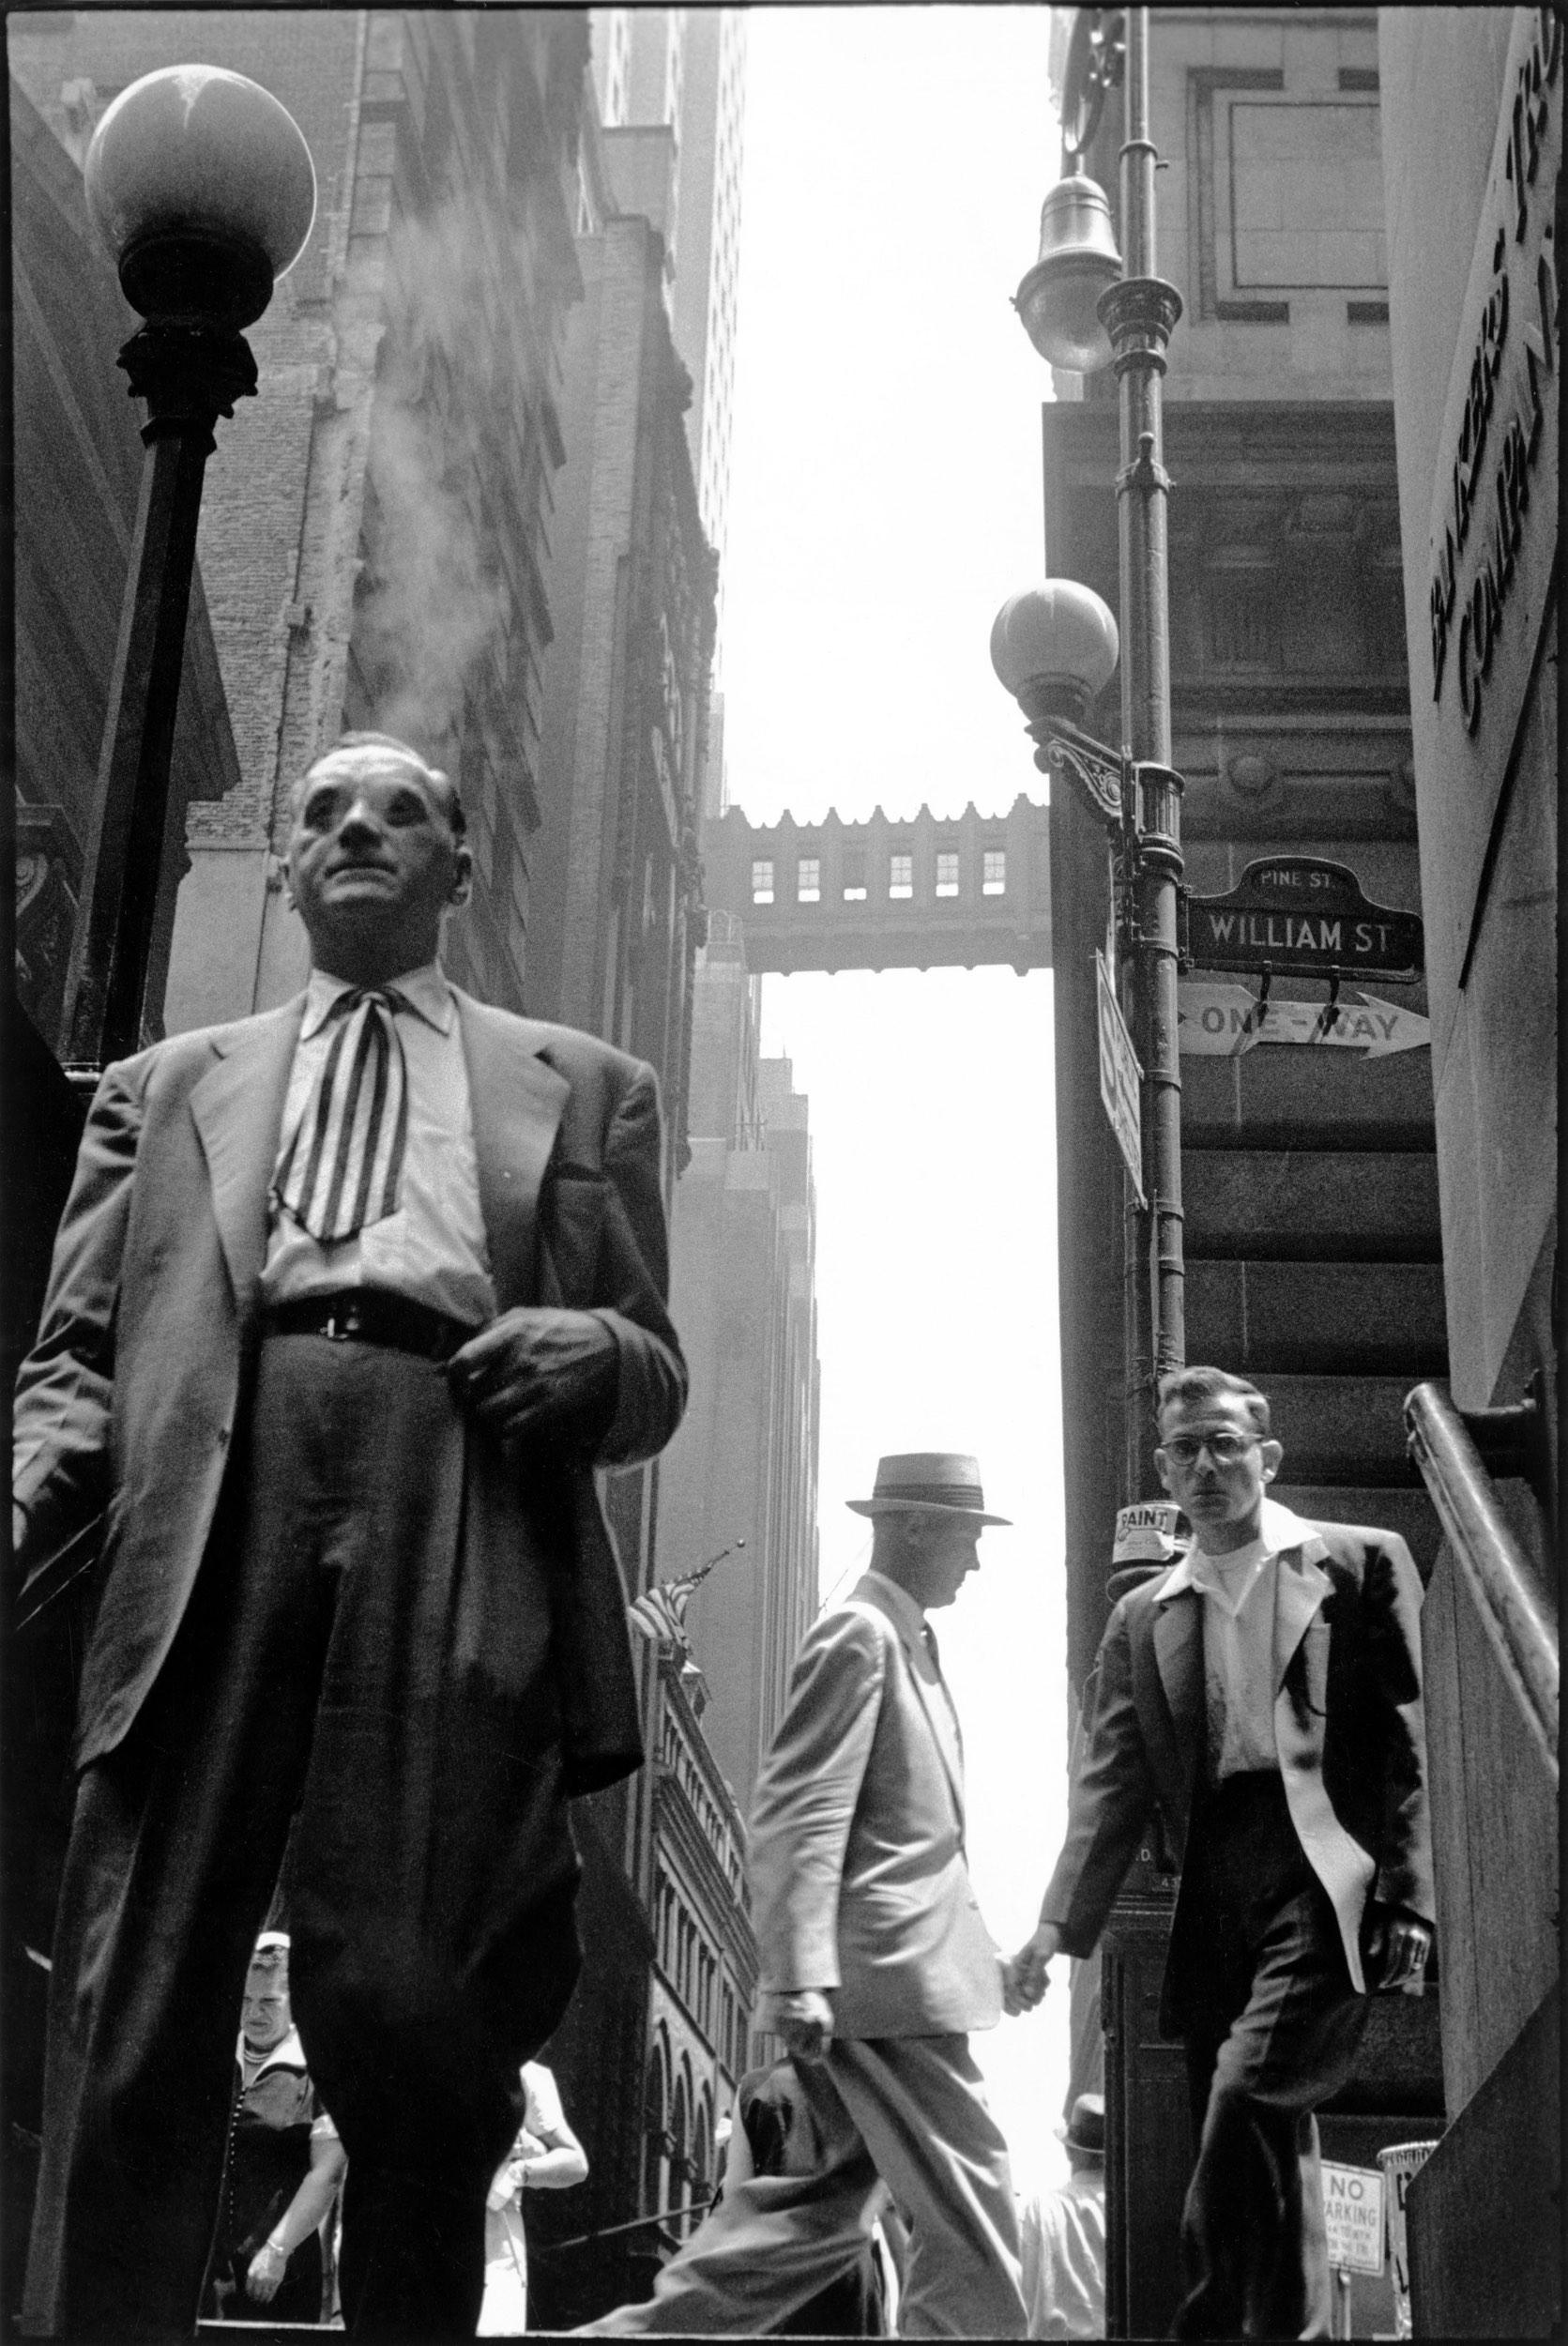 USA. New York City. 1956. Wall Street. Photo by Leonard Freed.